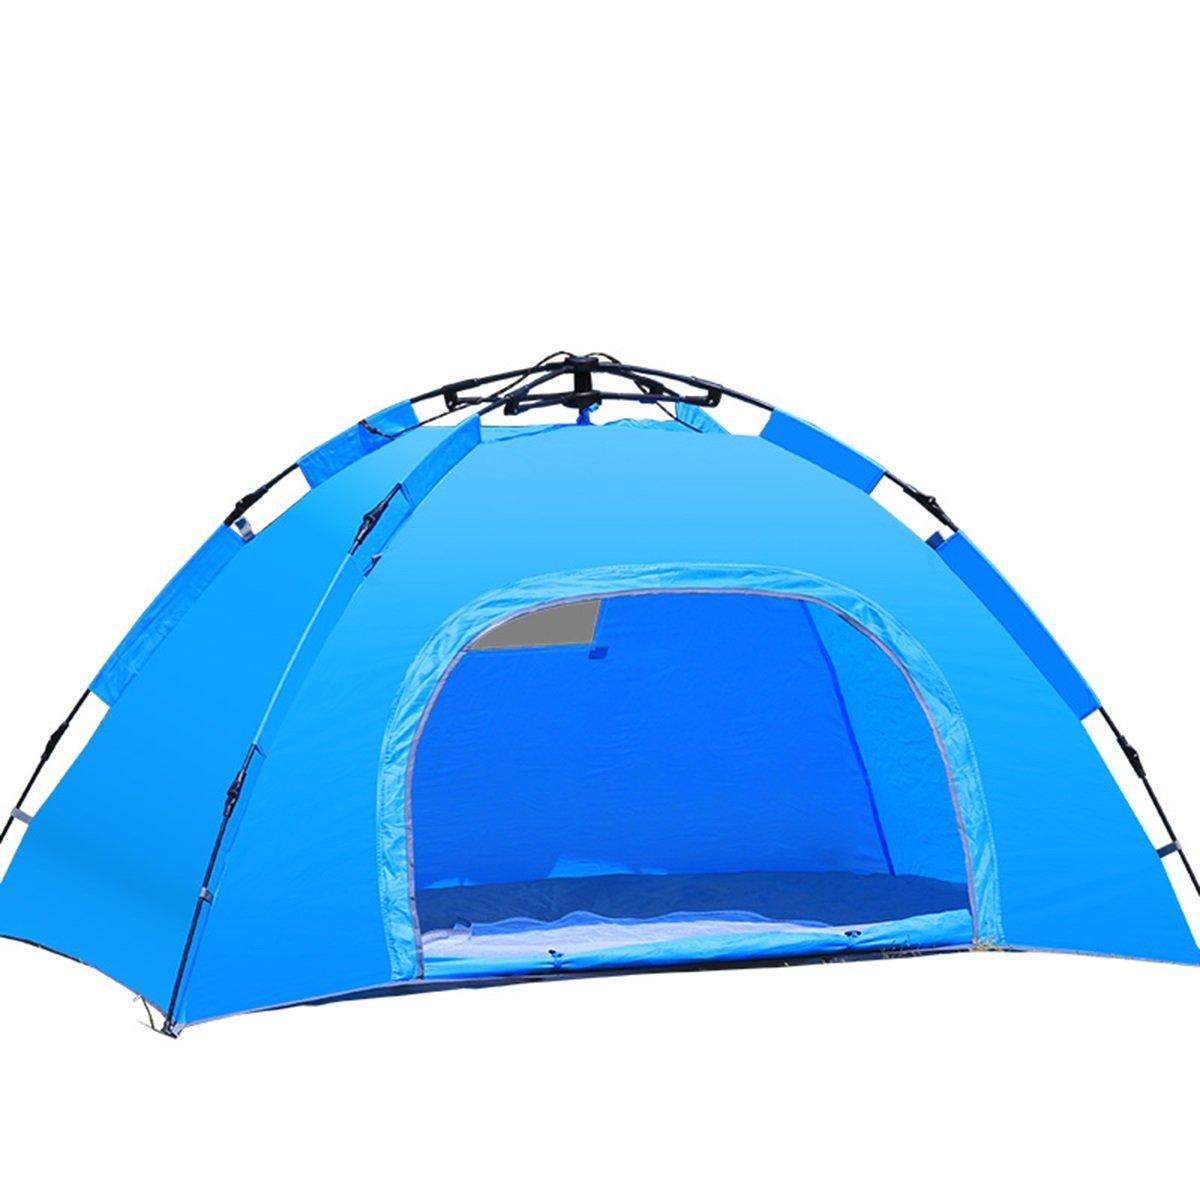 Zelt Vollautomatische Zelte Geschwindigkeit offen Leichte Outdoor 3-4 Personen Set Familie Regen Doppel 2 Personen Campingplatz